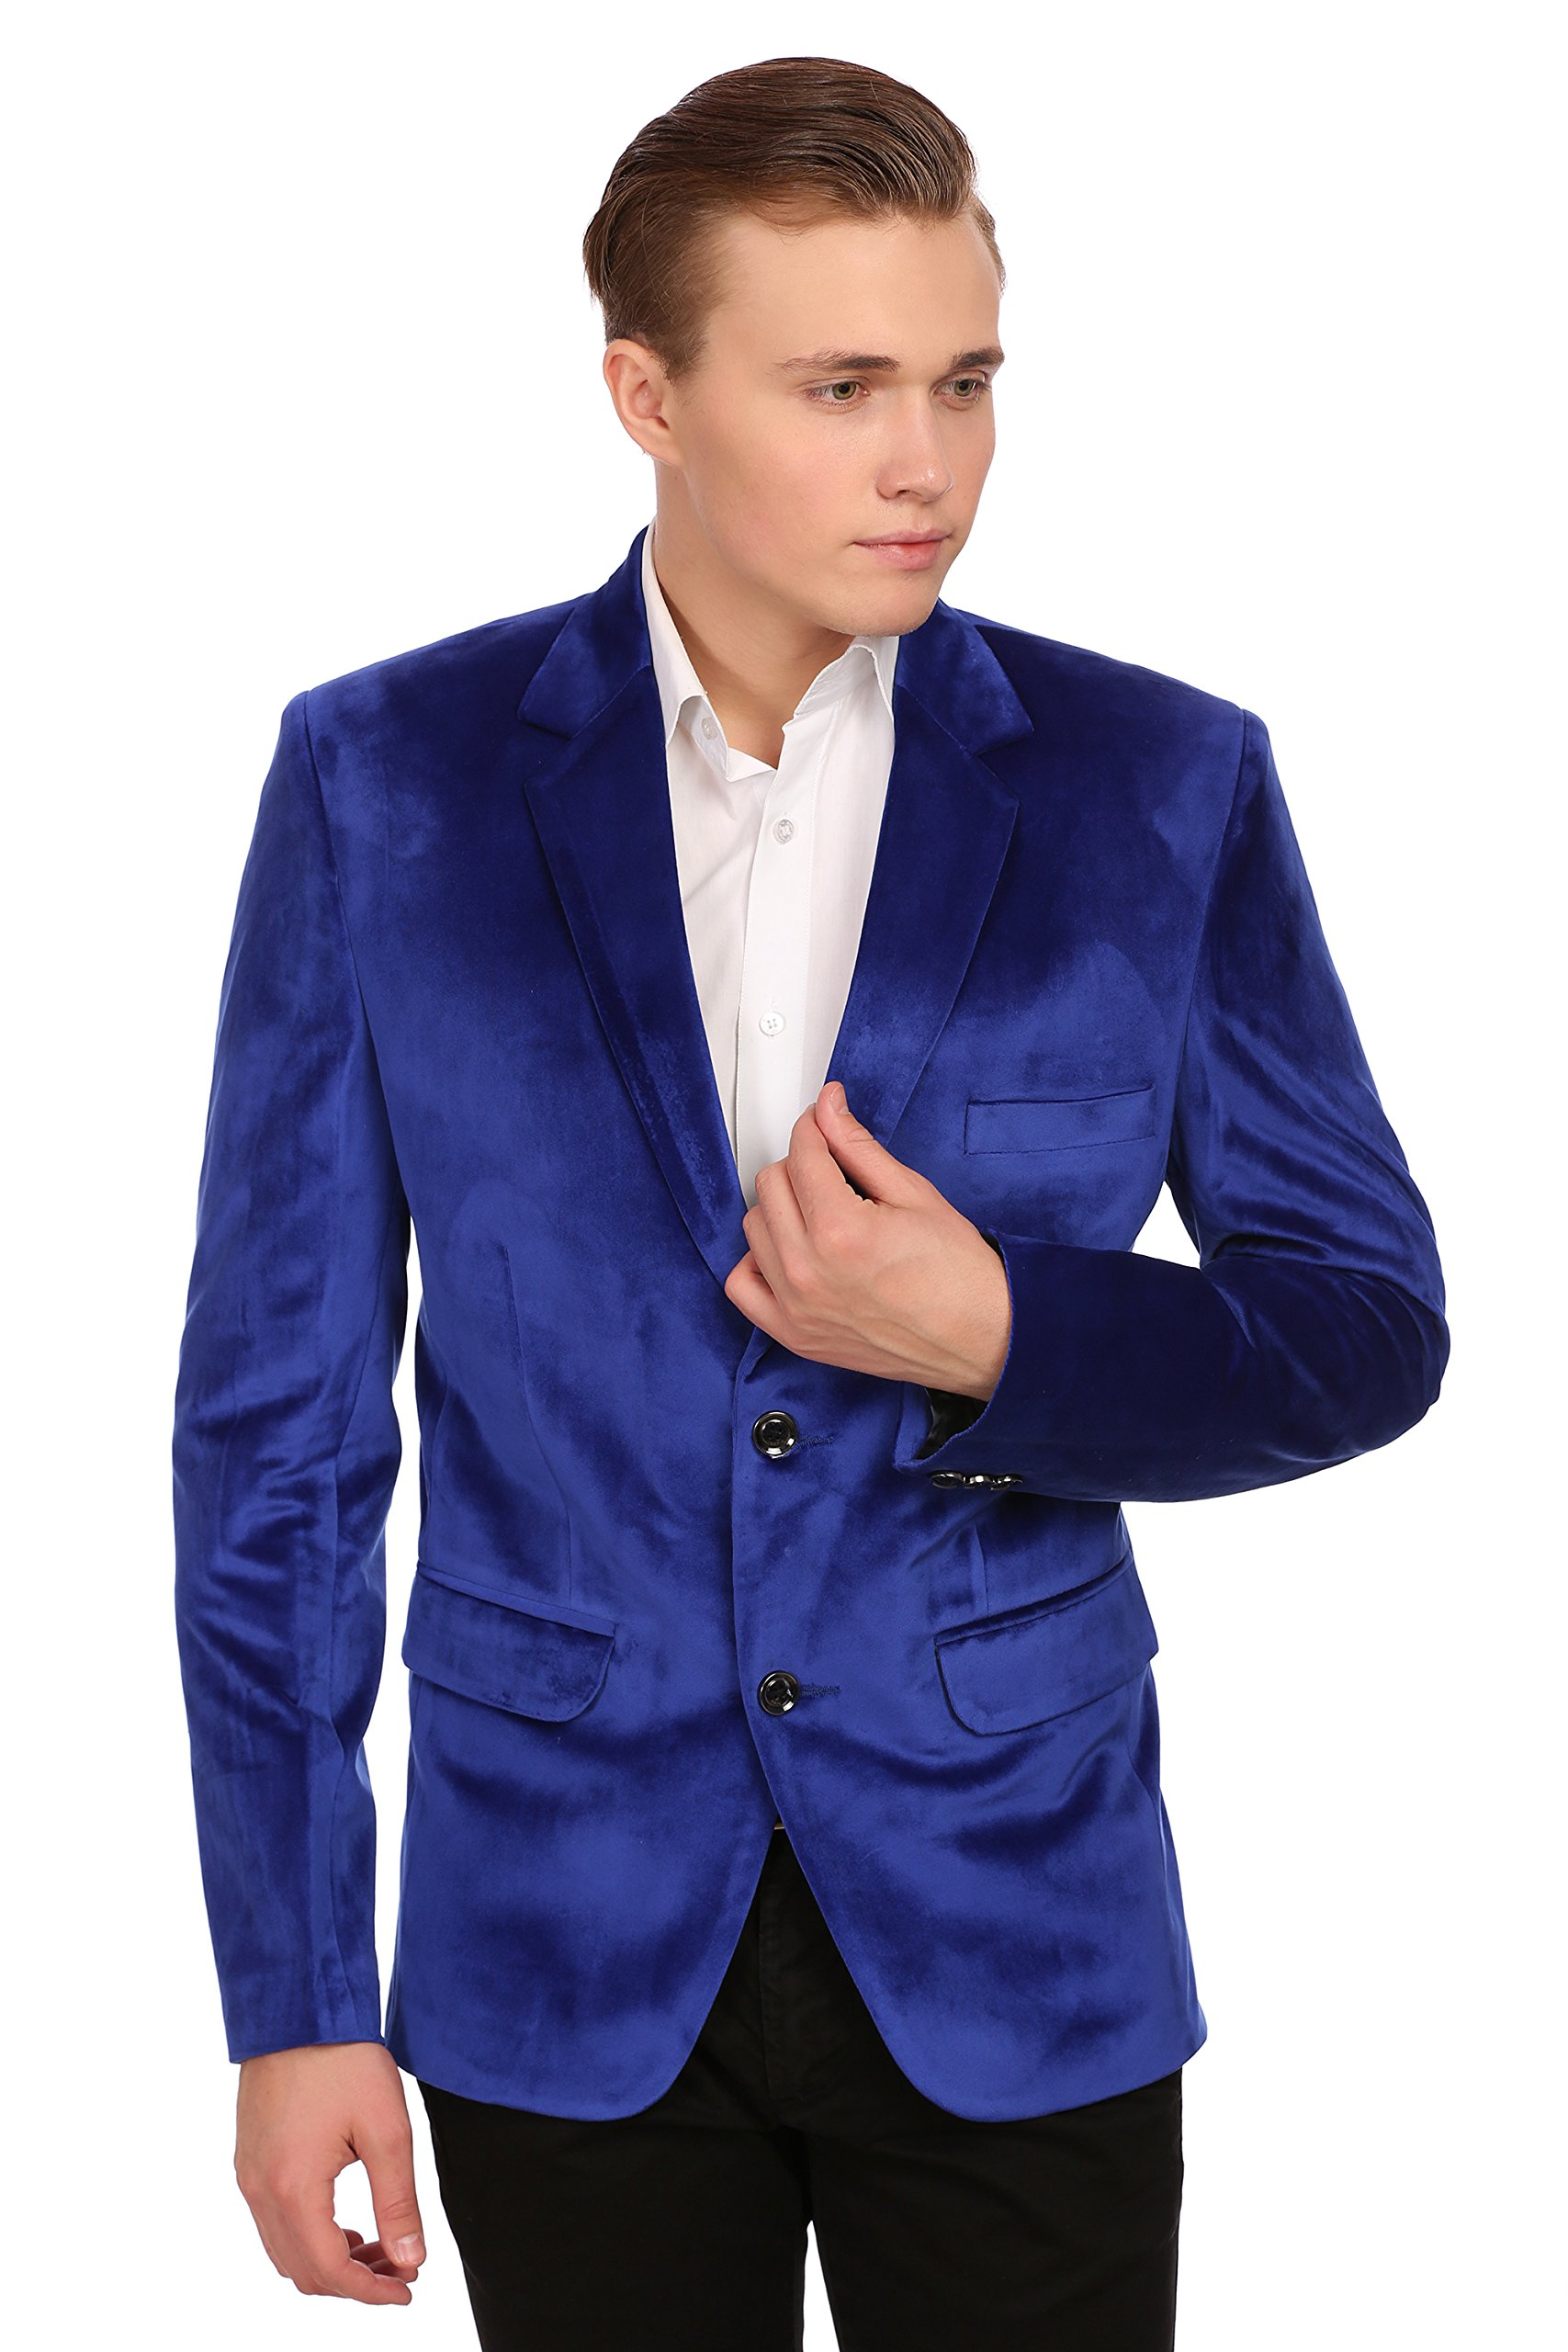 Wintage Men's Velvet Two Buttoned Notch Lapel Party Blue Coat Blazer by WINTAGE